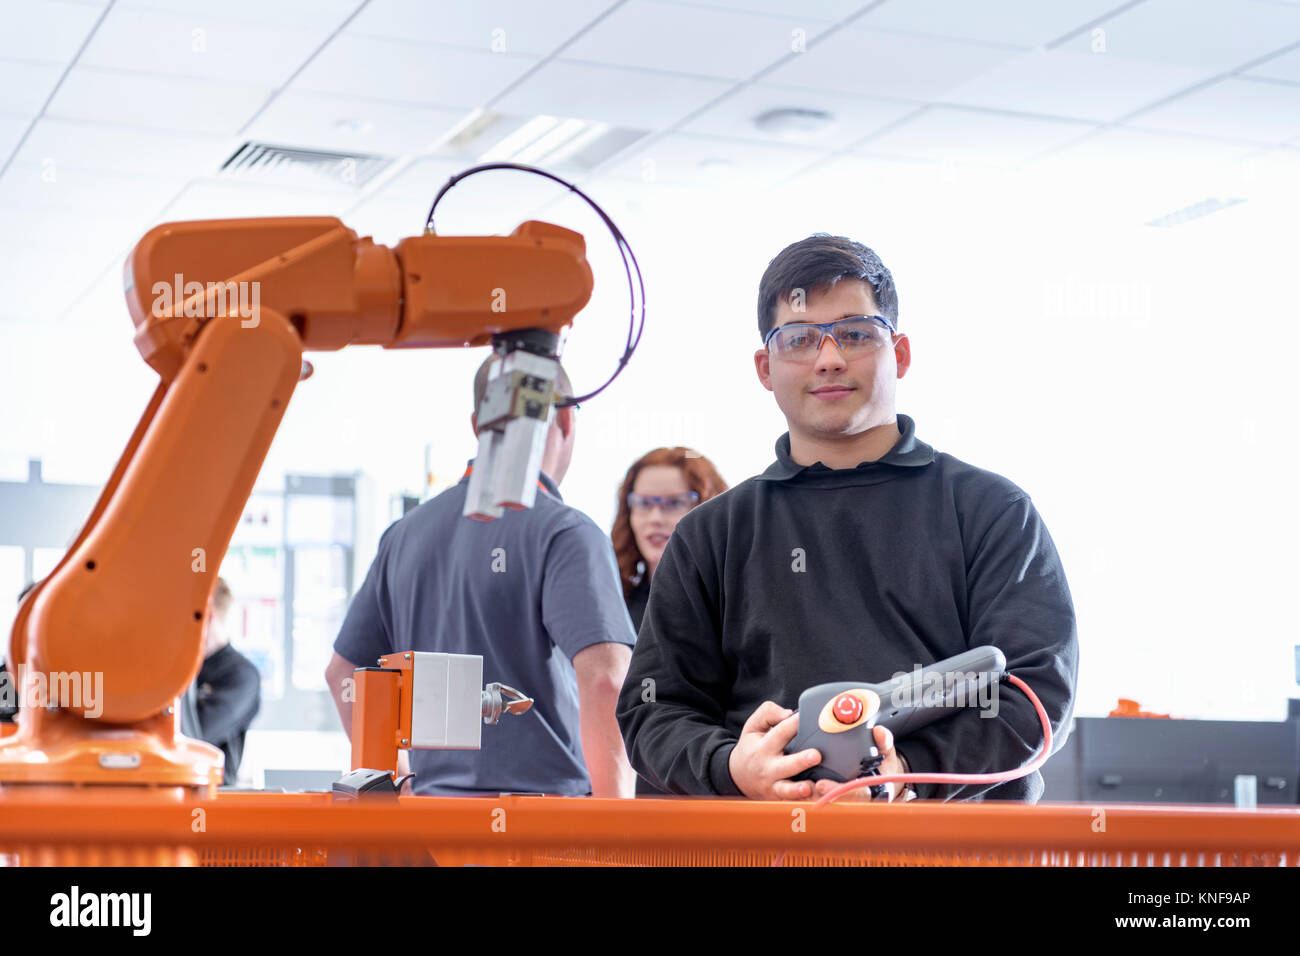 Portrait of robotics apprentice using test industrial robots in robotics facility Stock Photo